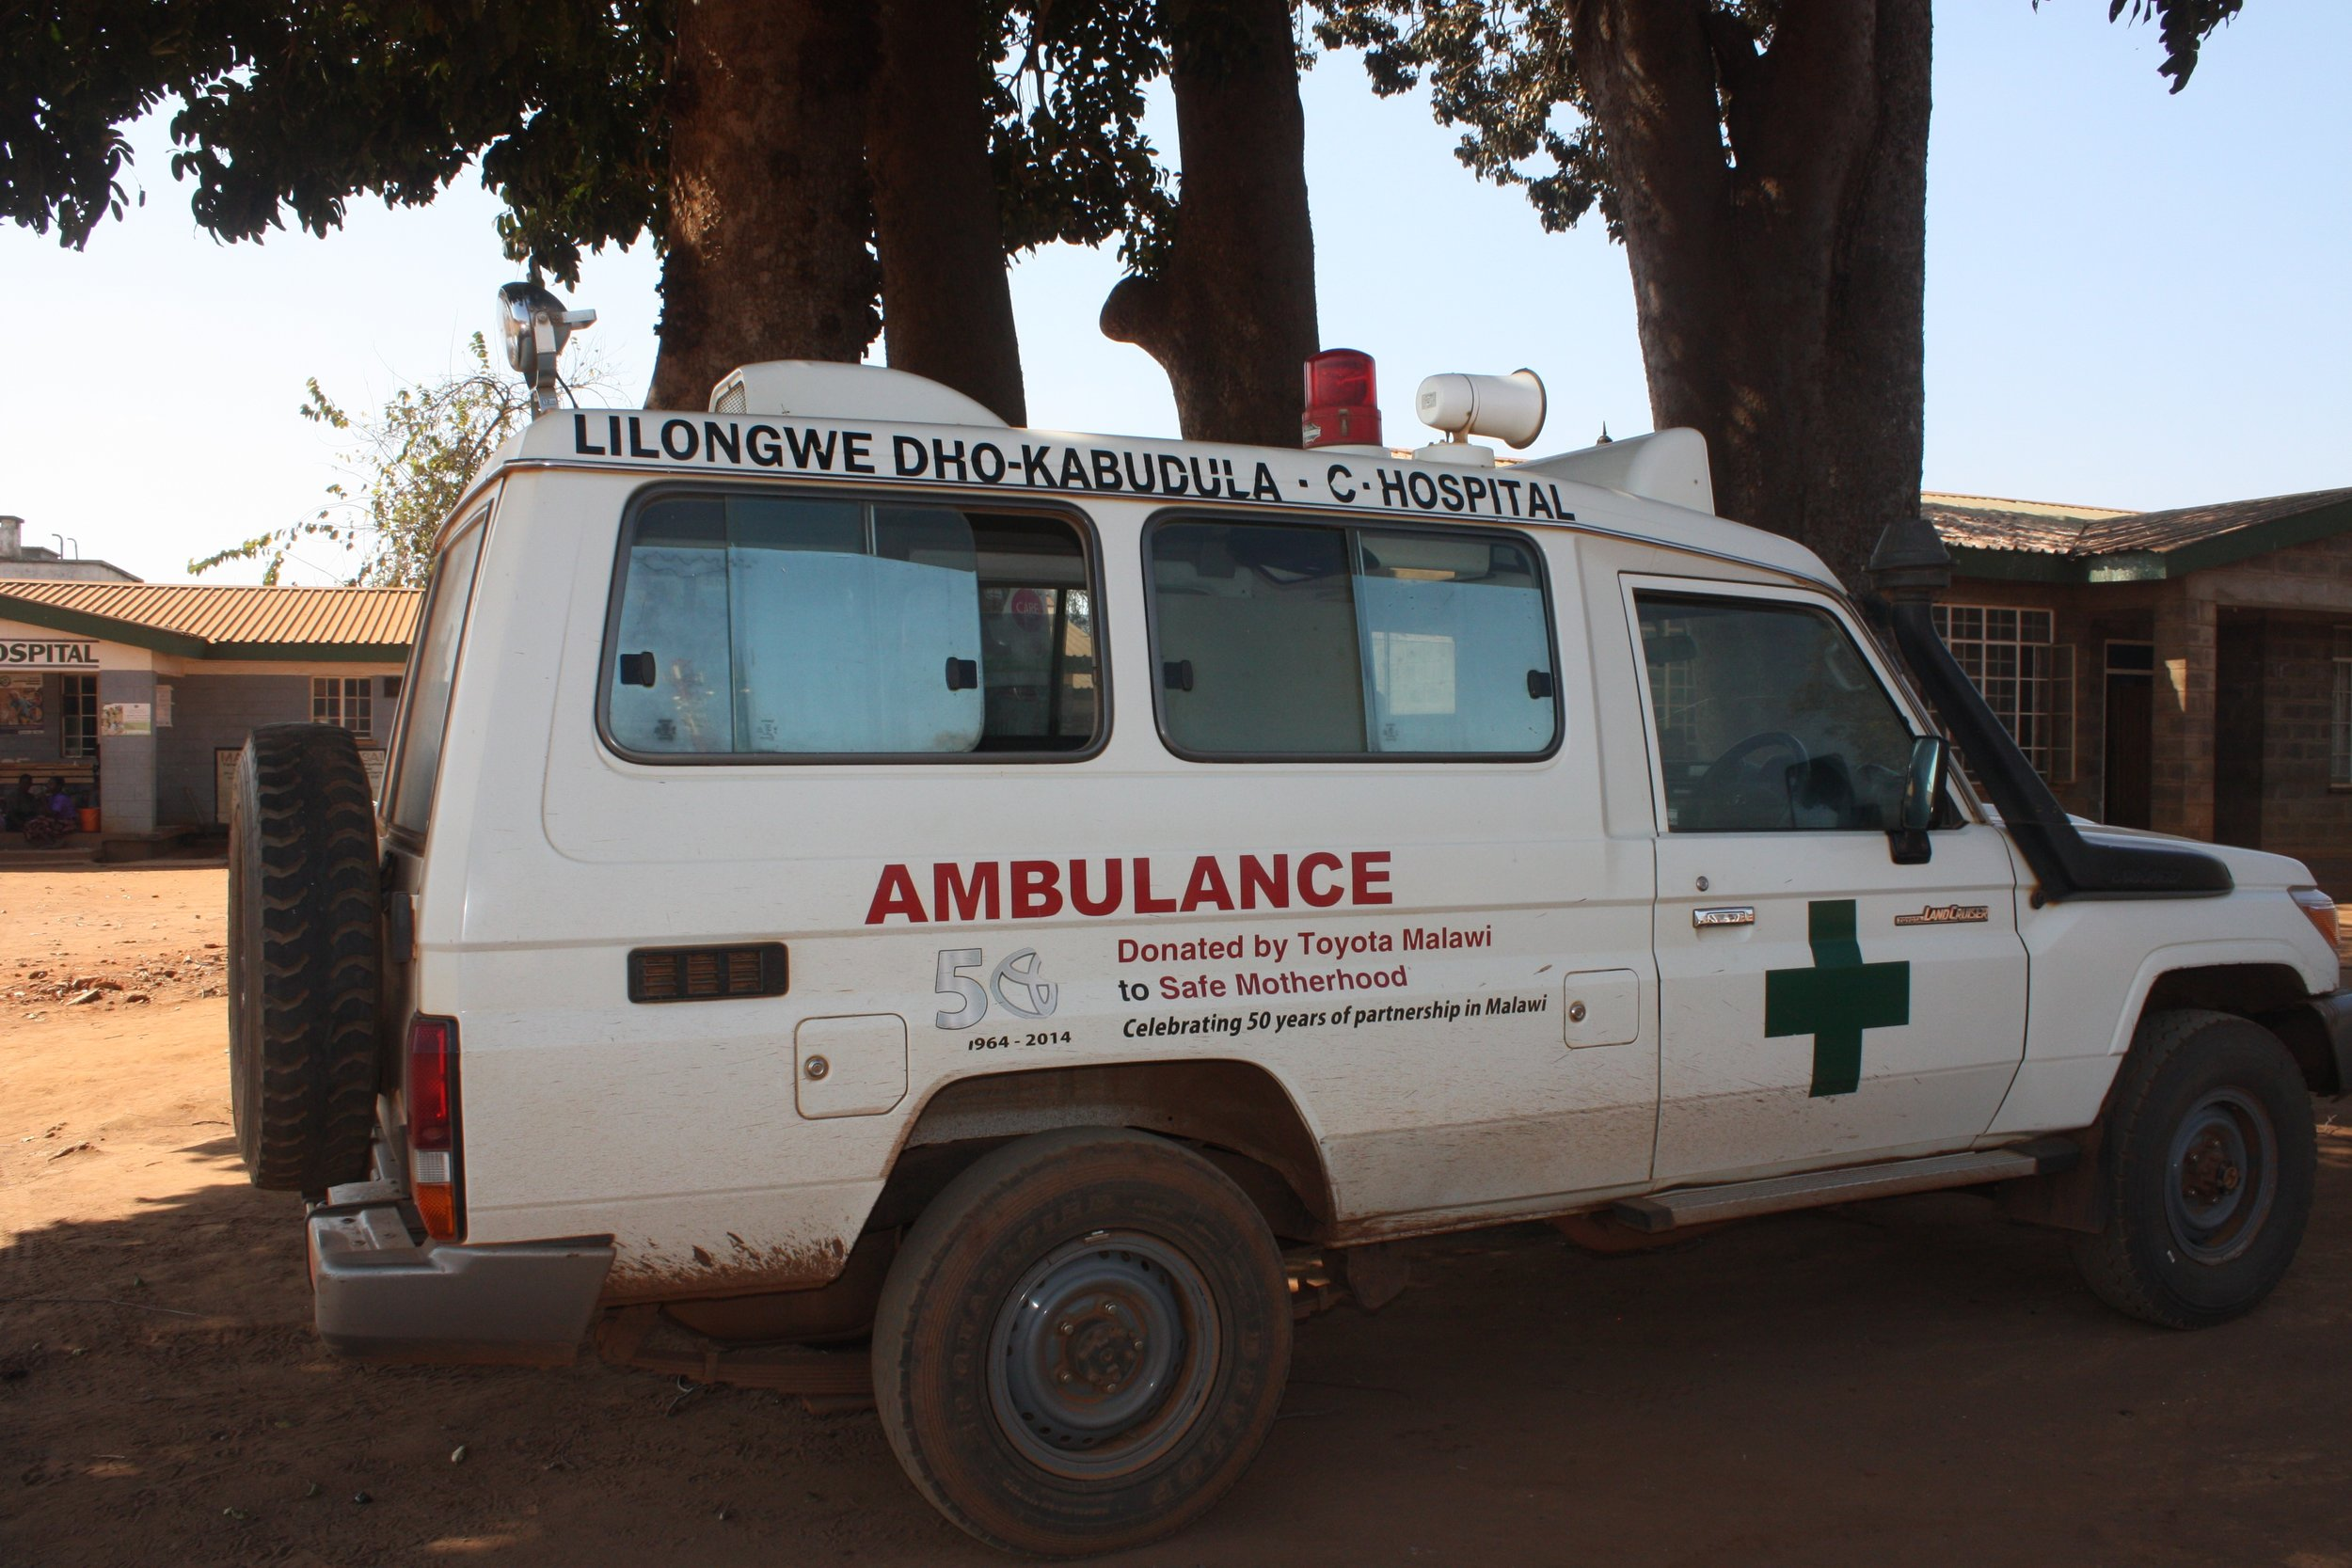 lone ambulance at Kabudula Hospital, July 2017